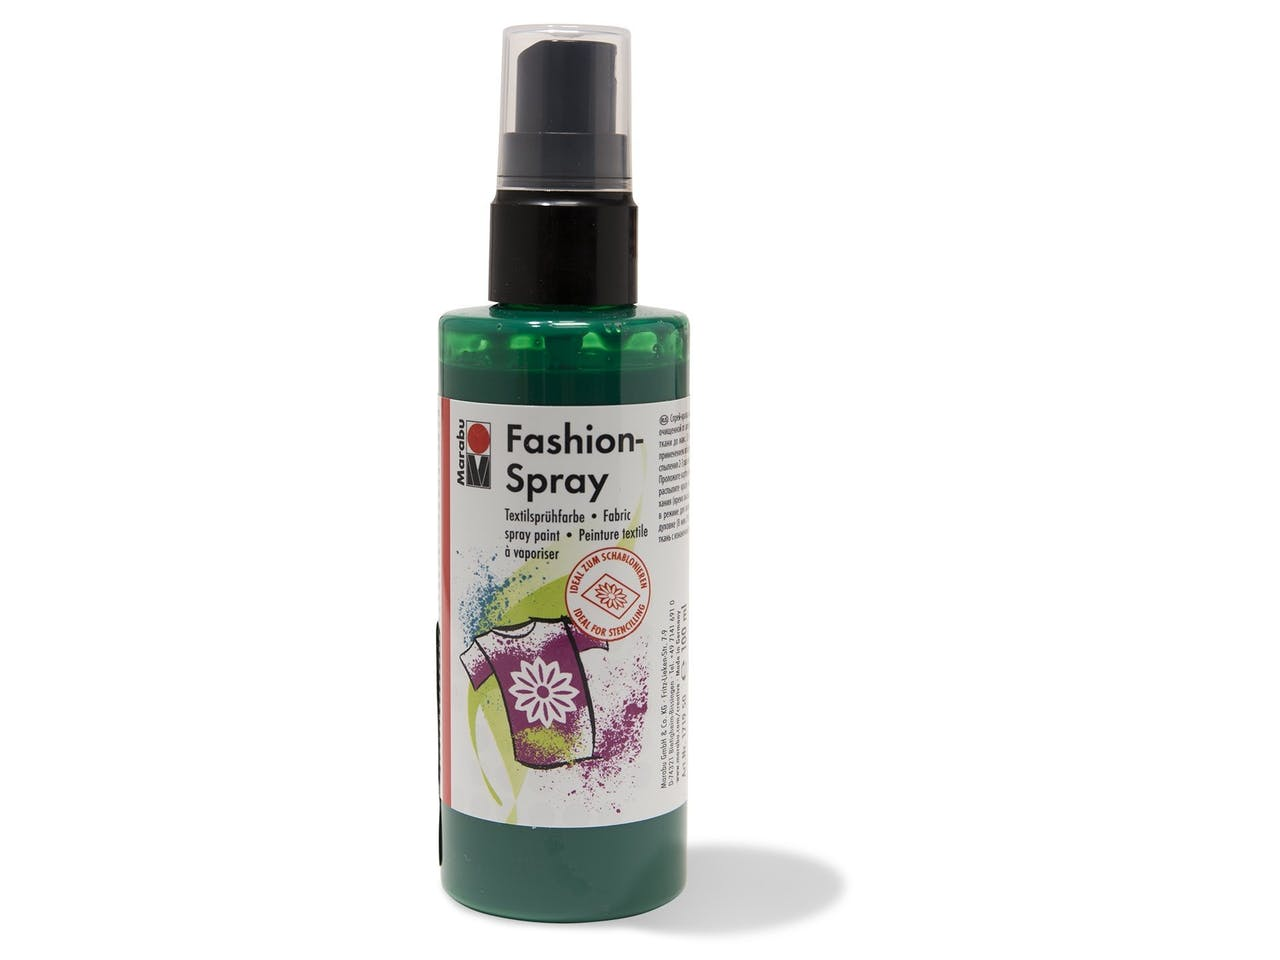 Marabu Fashion-Spray Textilsprühfarbe, Flasche, 100 ml, minze (153)